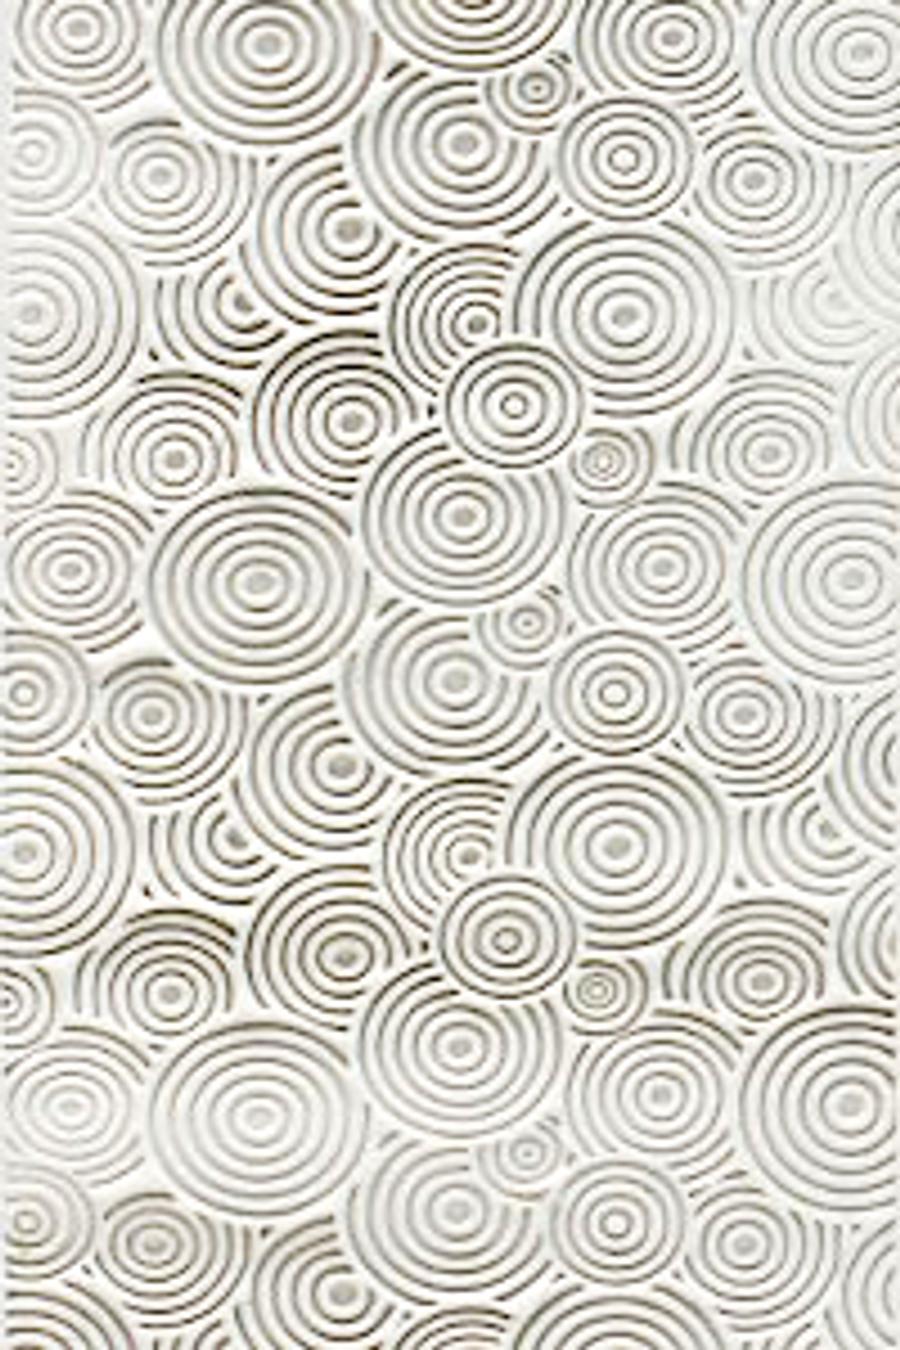 Acrylic Texture Small Roller (KTR) - Raindrop Ripples - 5cm